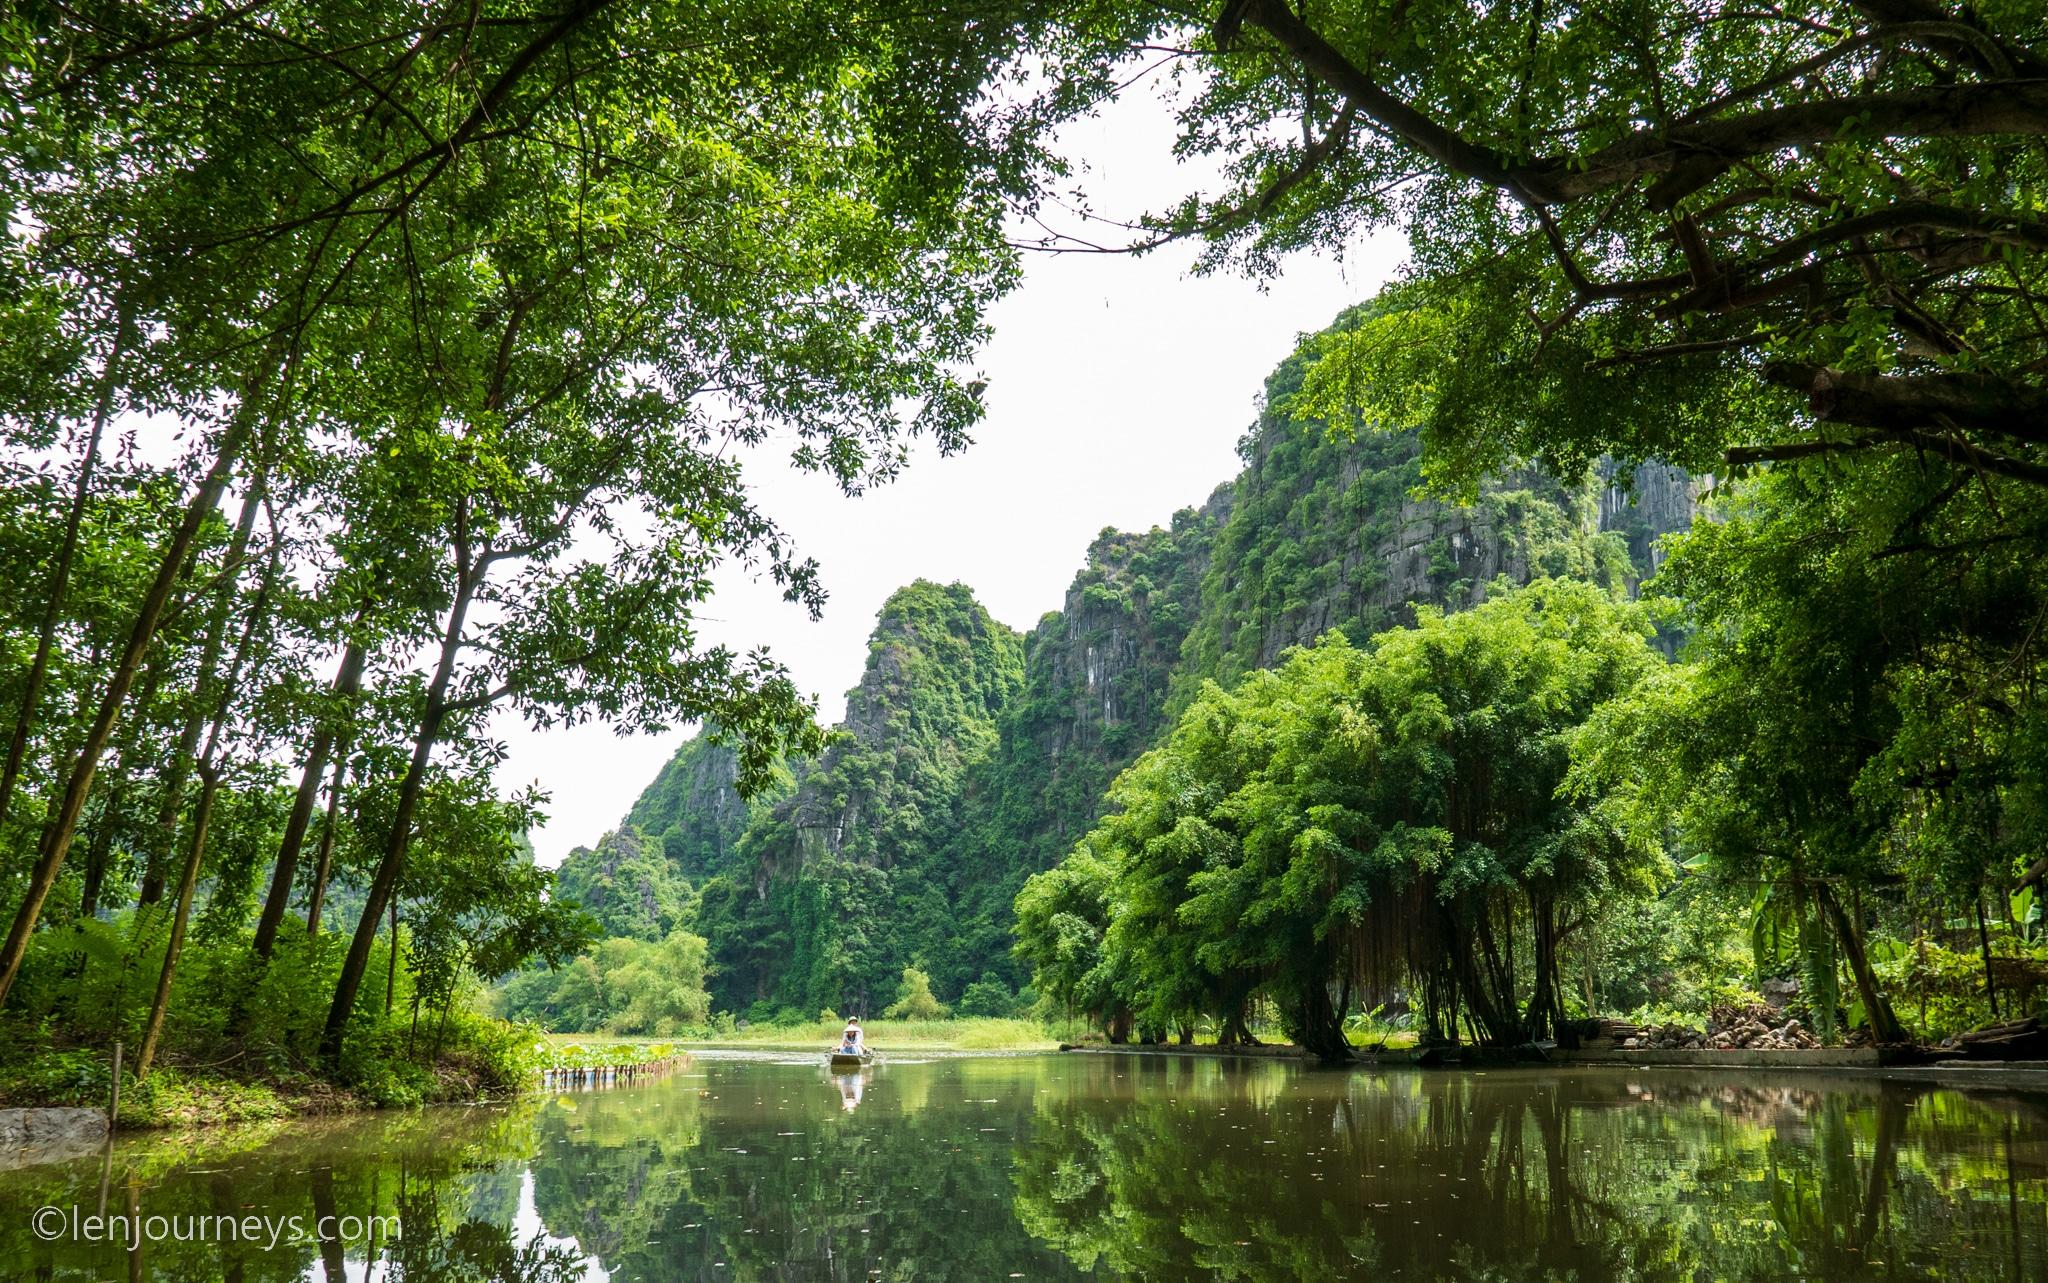 Dreamlike landscape at Tam Coc, Ninh Binh